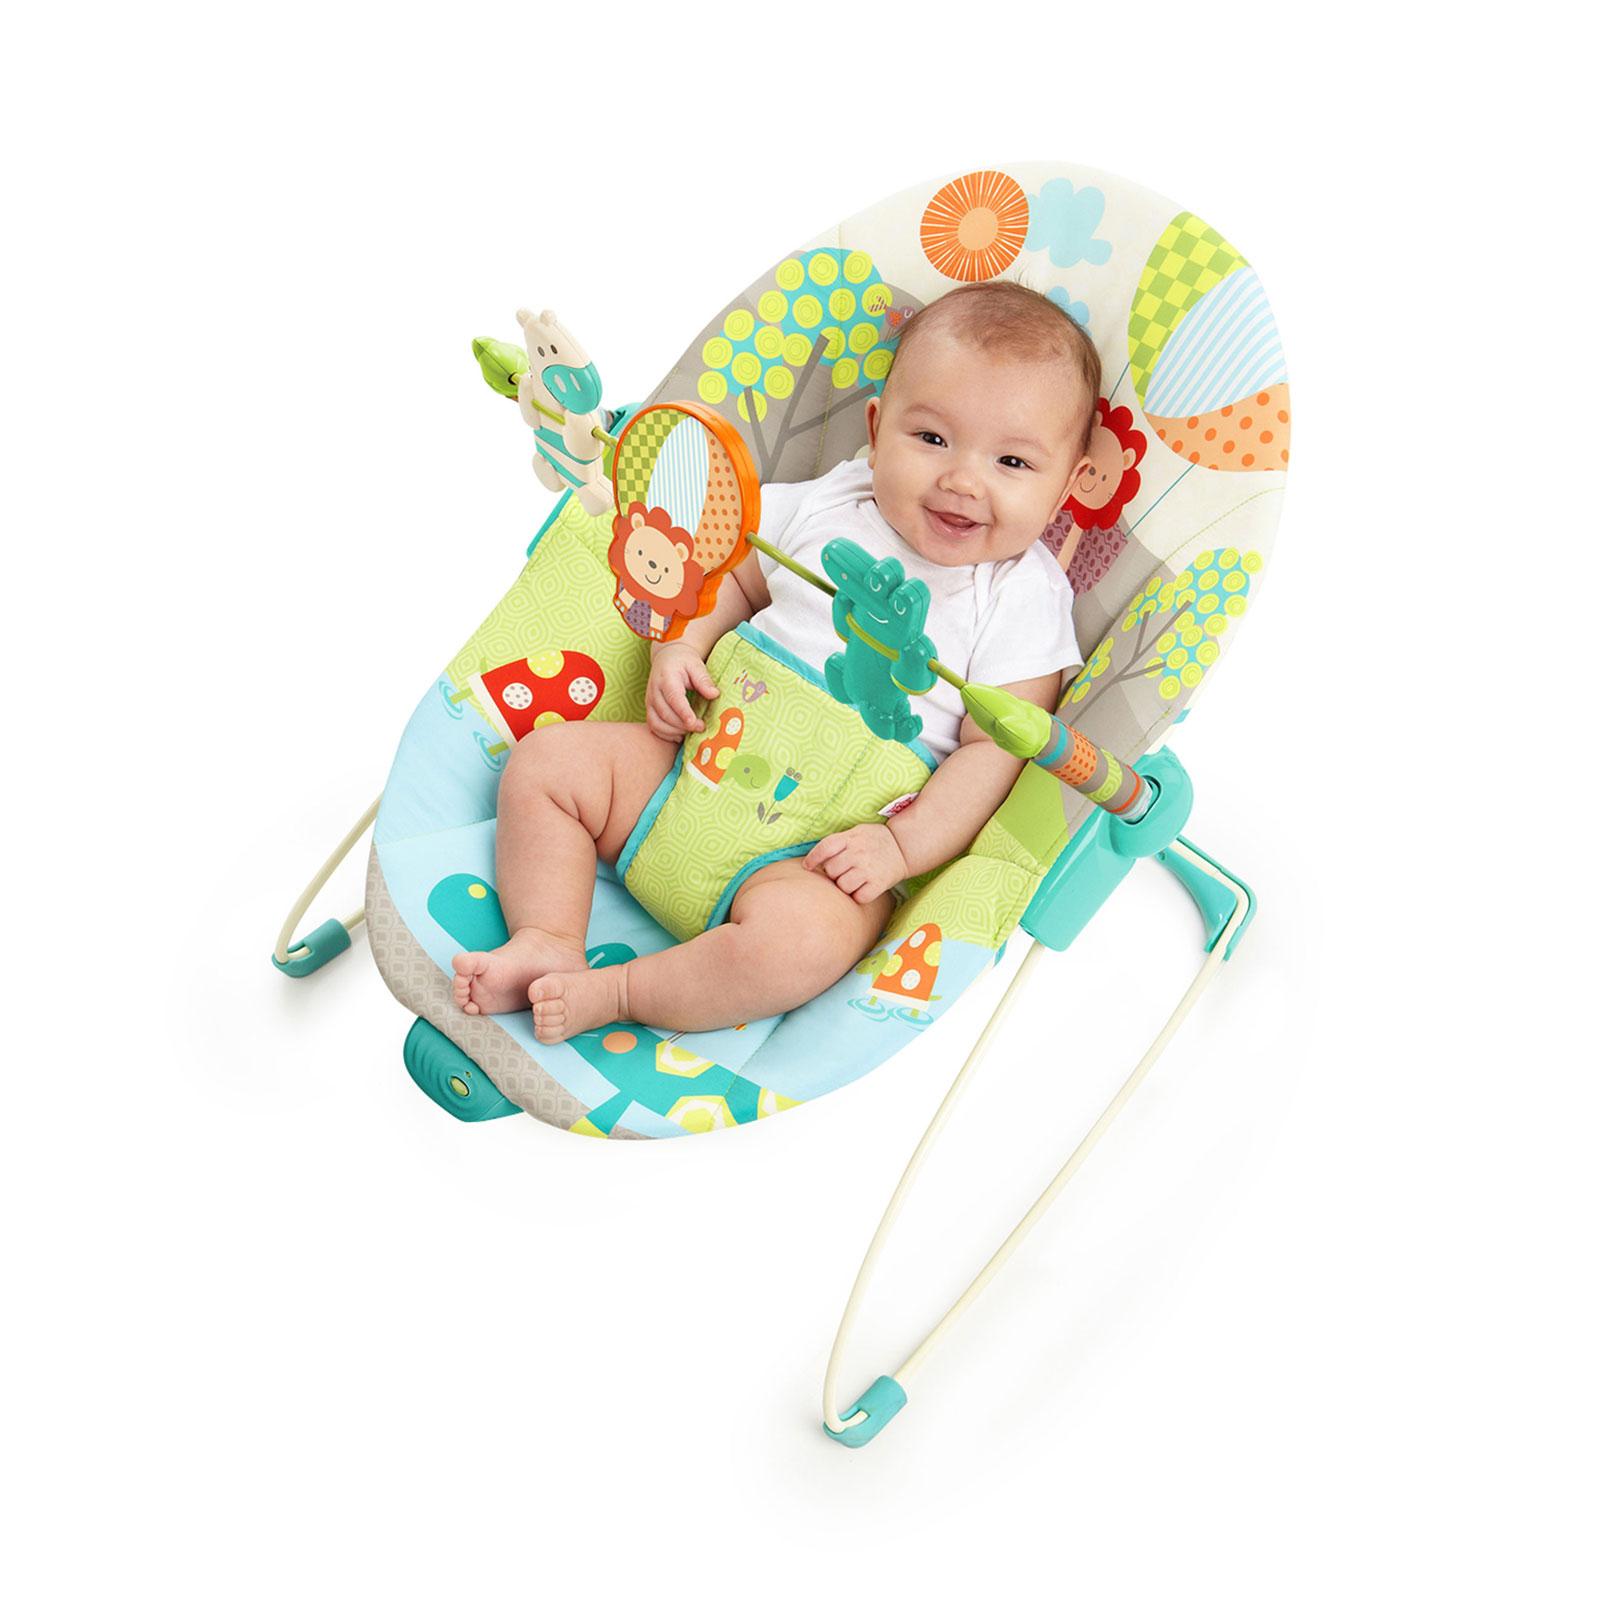 Кресло-качалка Bright Starts Забавные джунгли